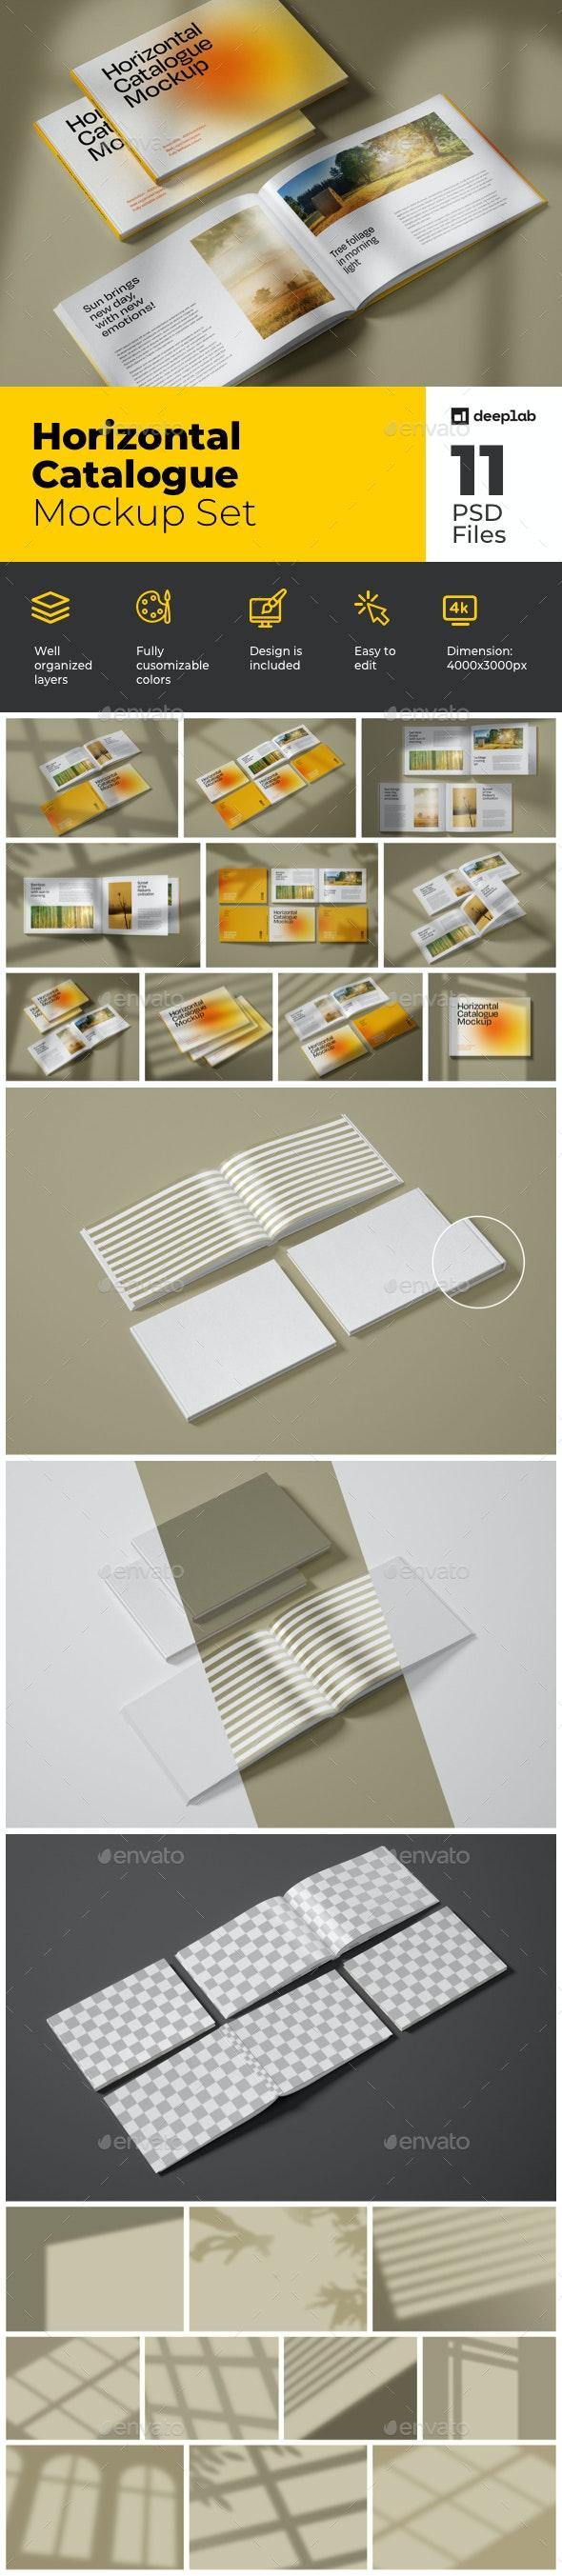 Horizontal Catalogue Mockup Set - Product Mock-Ups Graphics